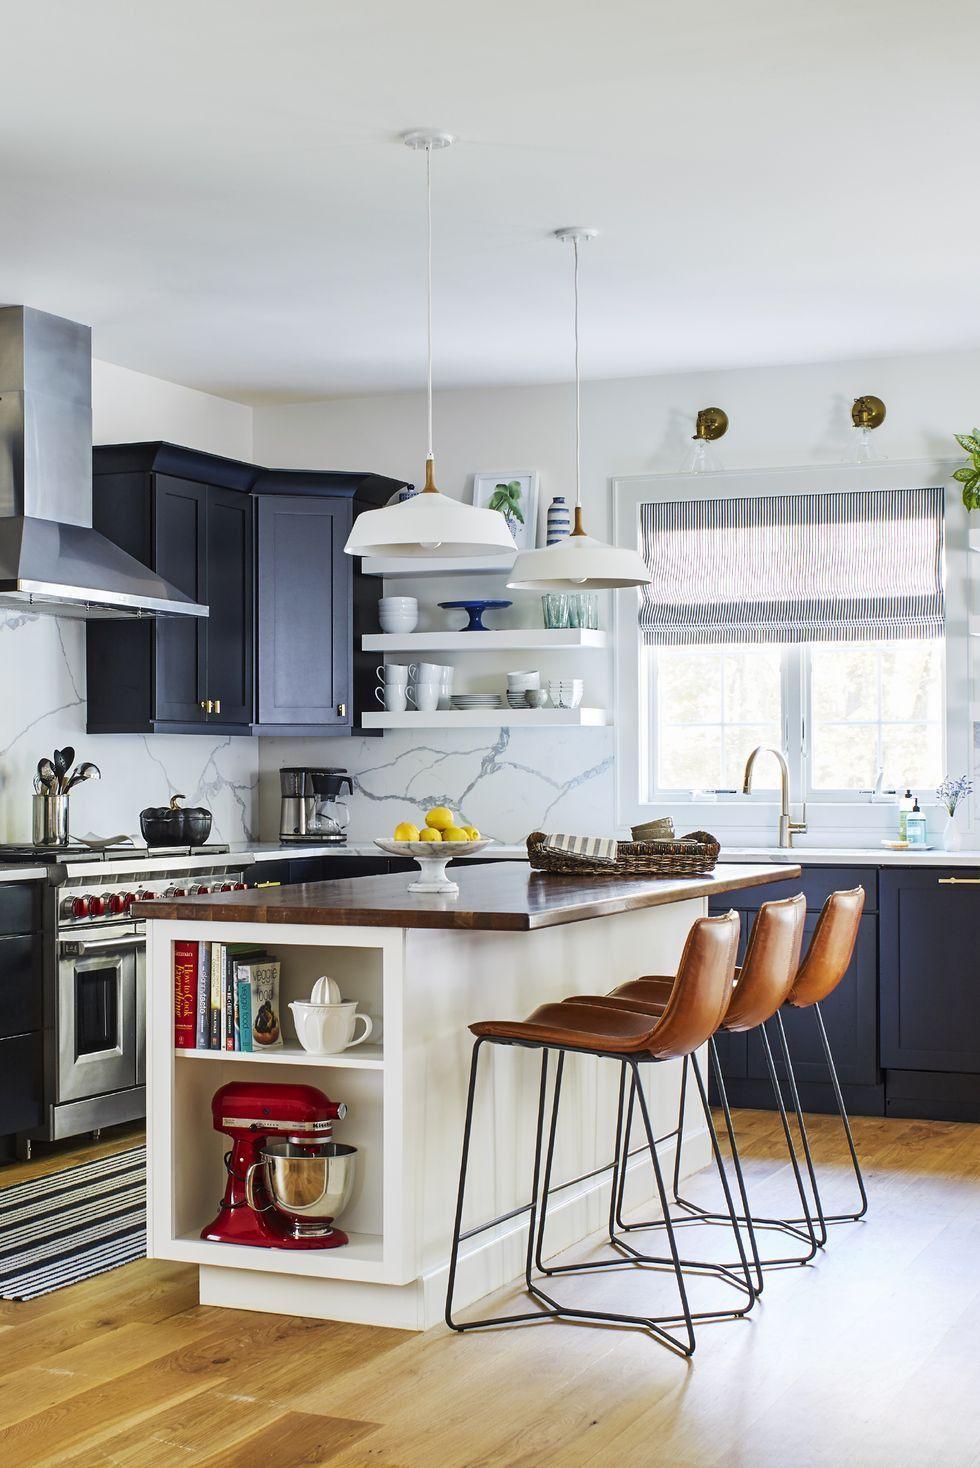 Best Small Kitchen Ideas 2020 Kitchen Design Small House Design Kitchen Small Kitchen Decor